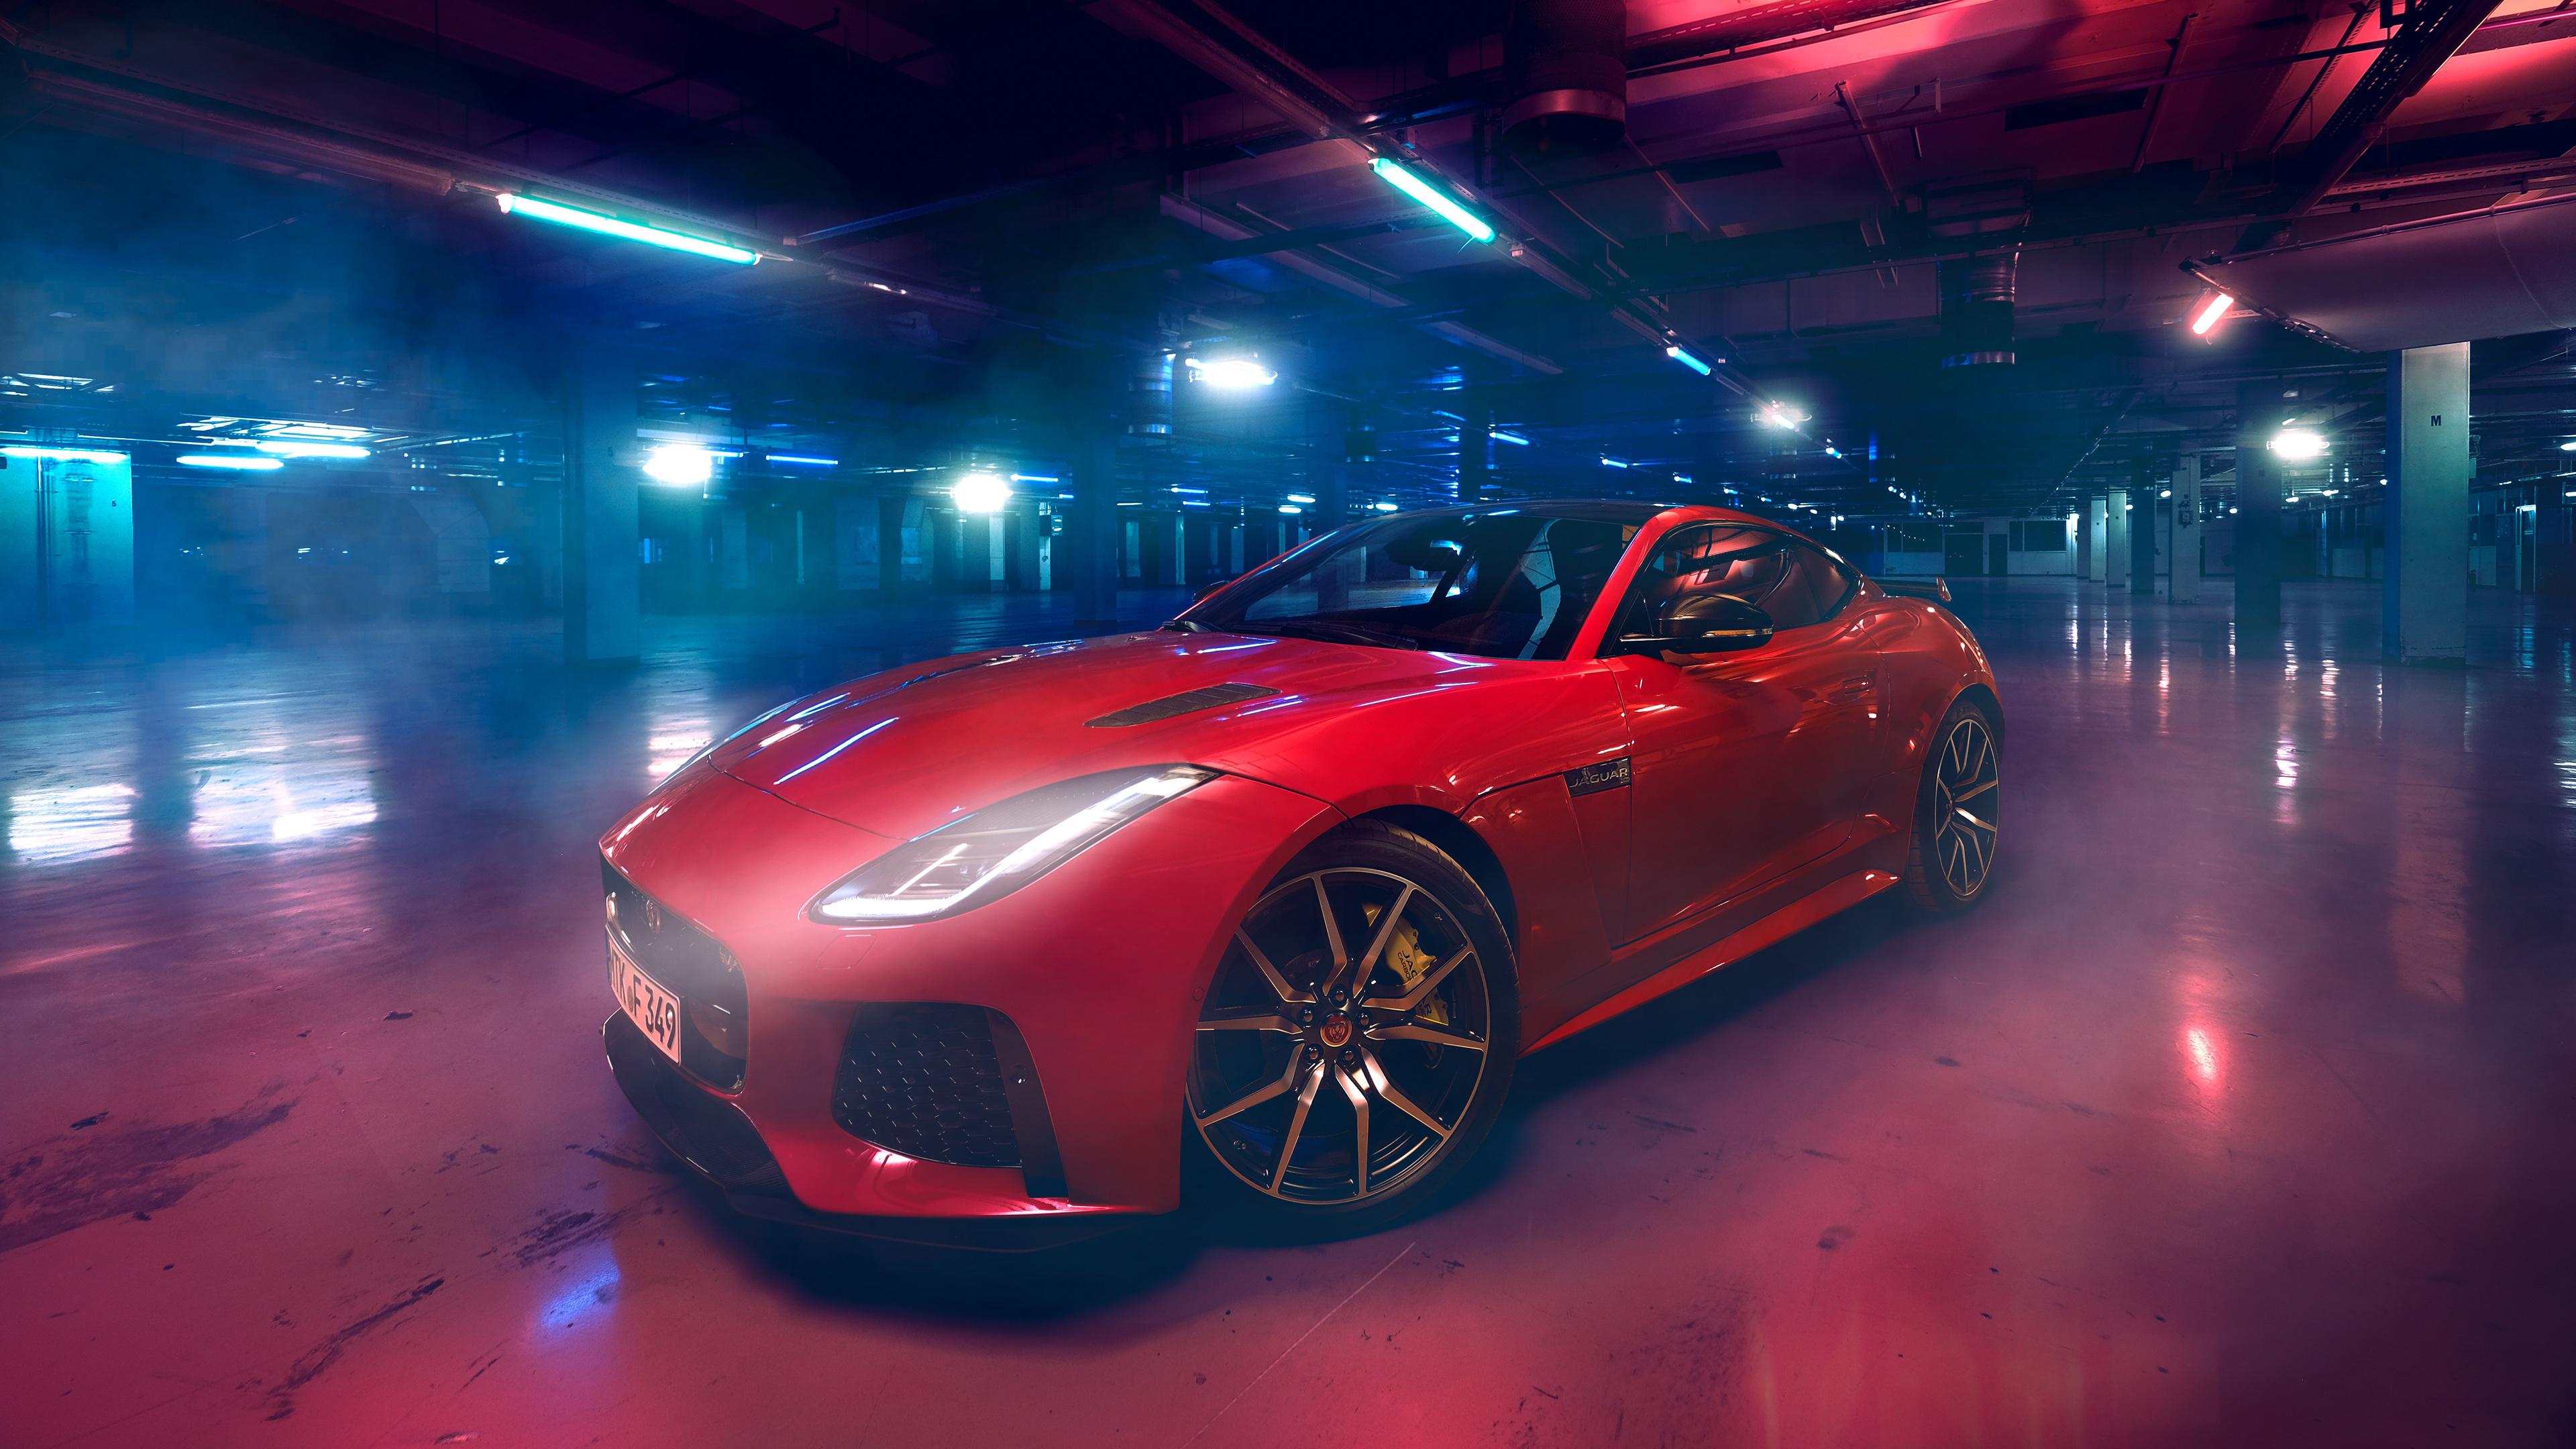 Jaguar F Type Svr >> Jaguar F-Type SVR 4K Wallpaper | HD Car Wallpapers | ID #10781